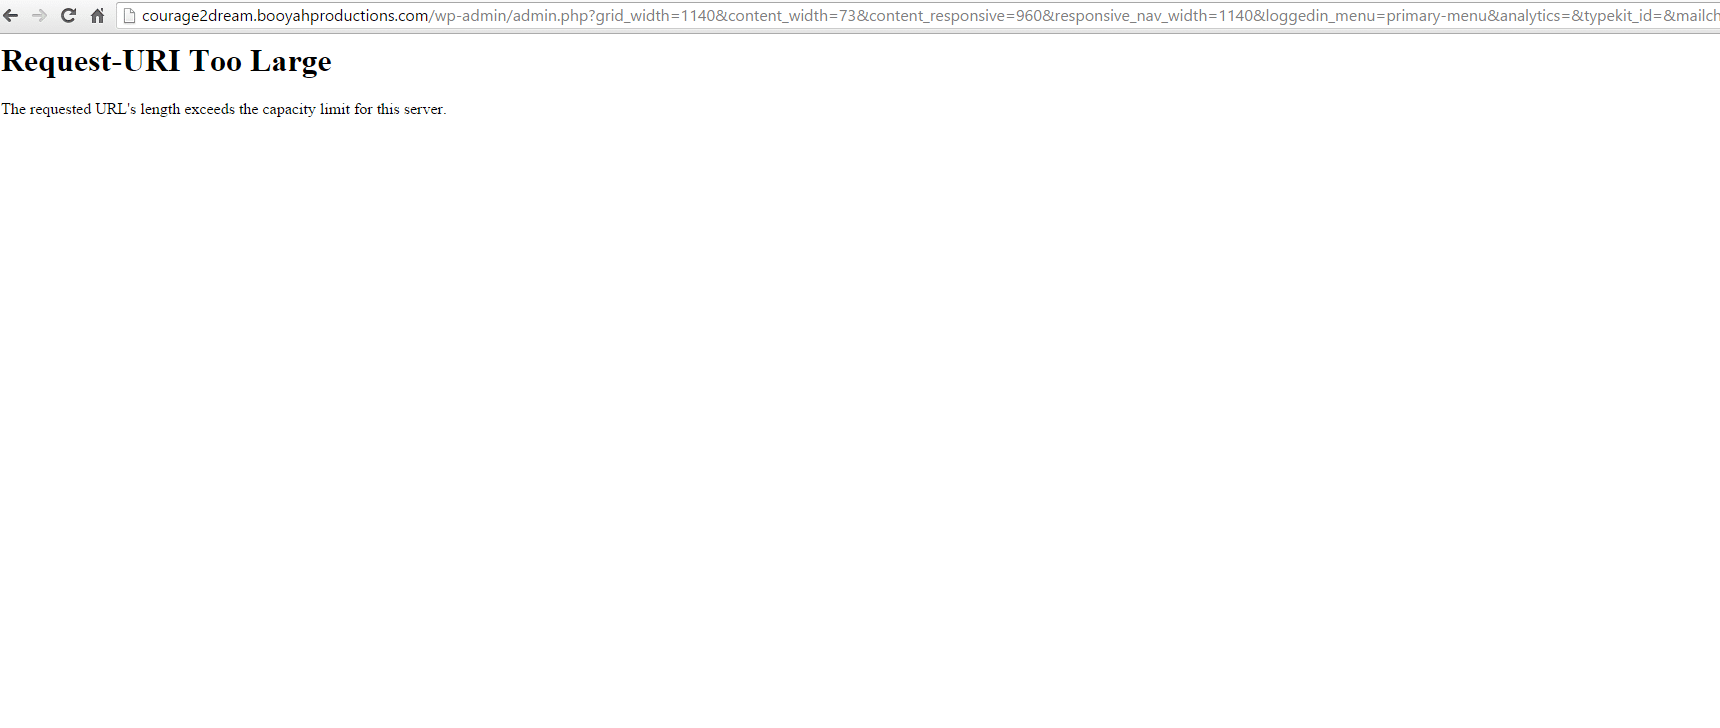 Template Errors 3